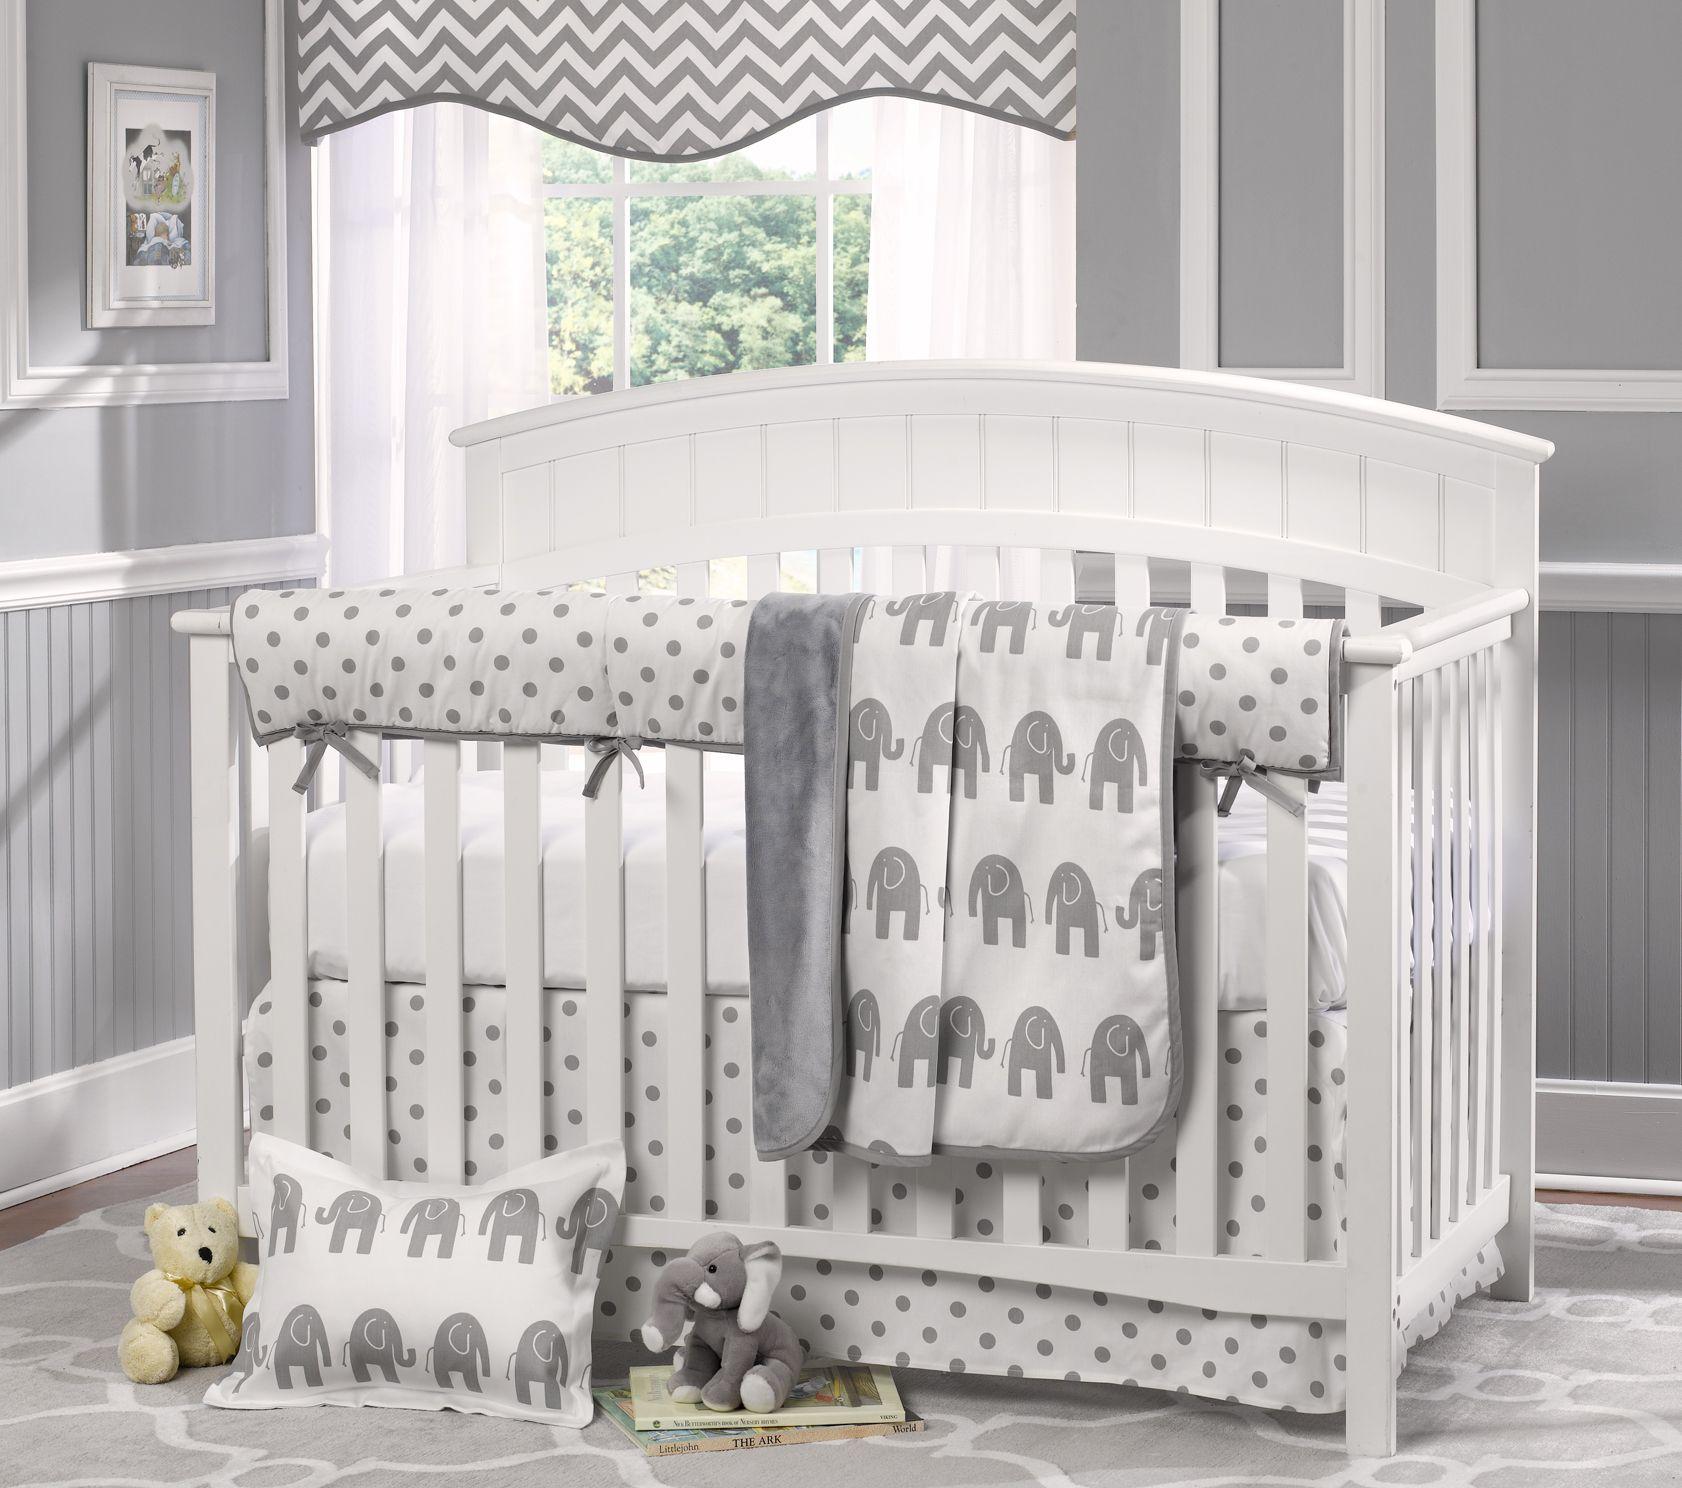 Gray Elephant Baby Bedding Crib Bedding Pinterest